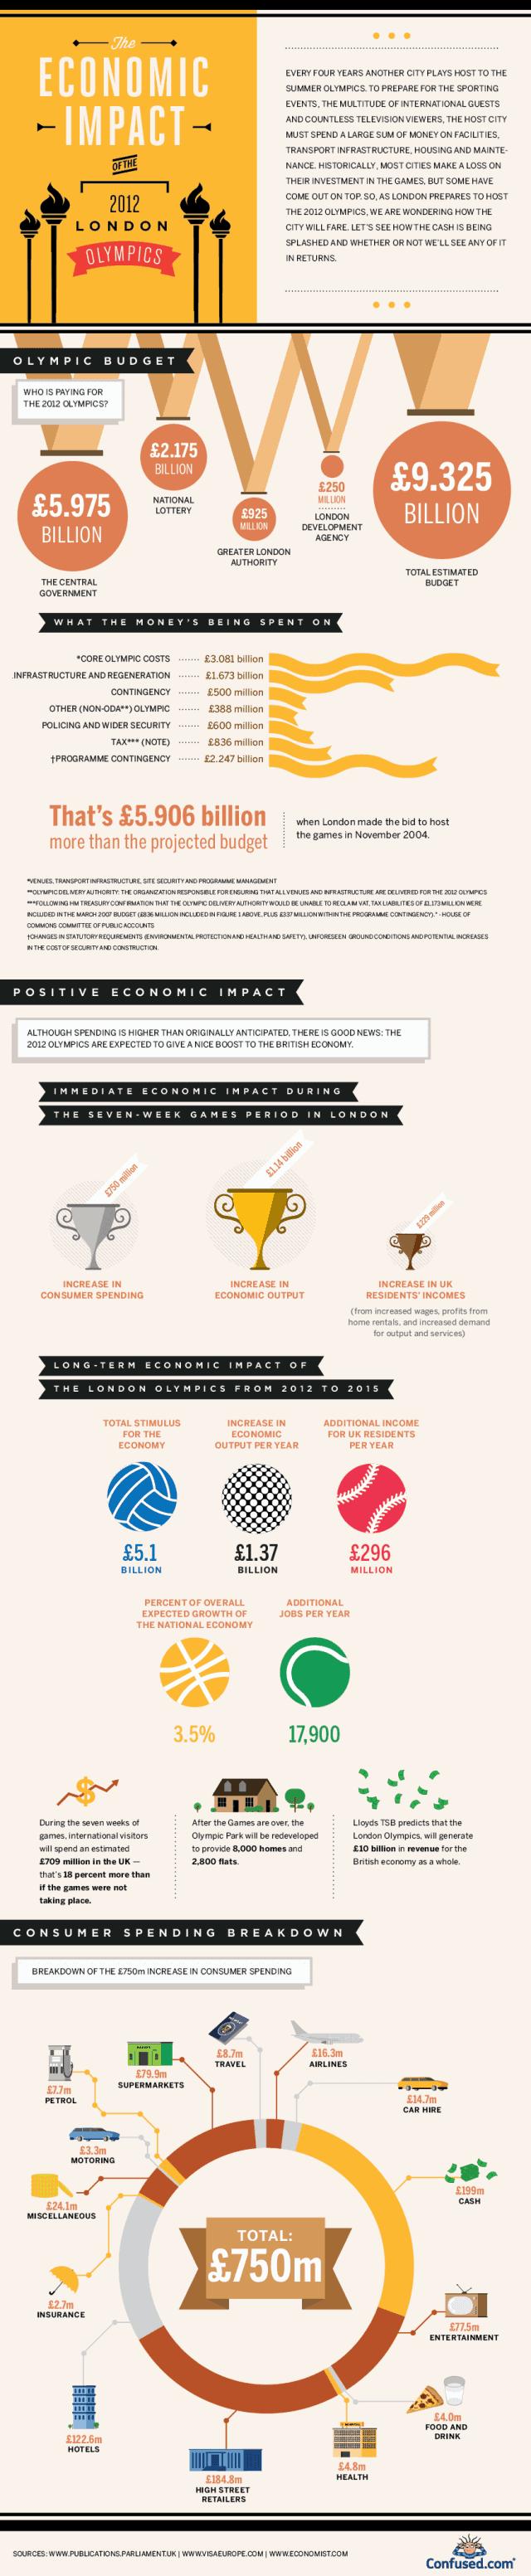 Economic Impact of the 2012 London Olympics